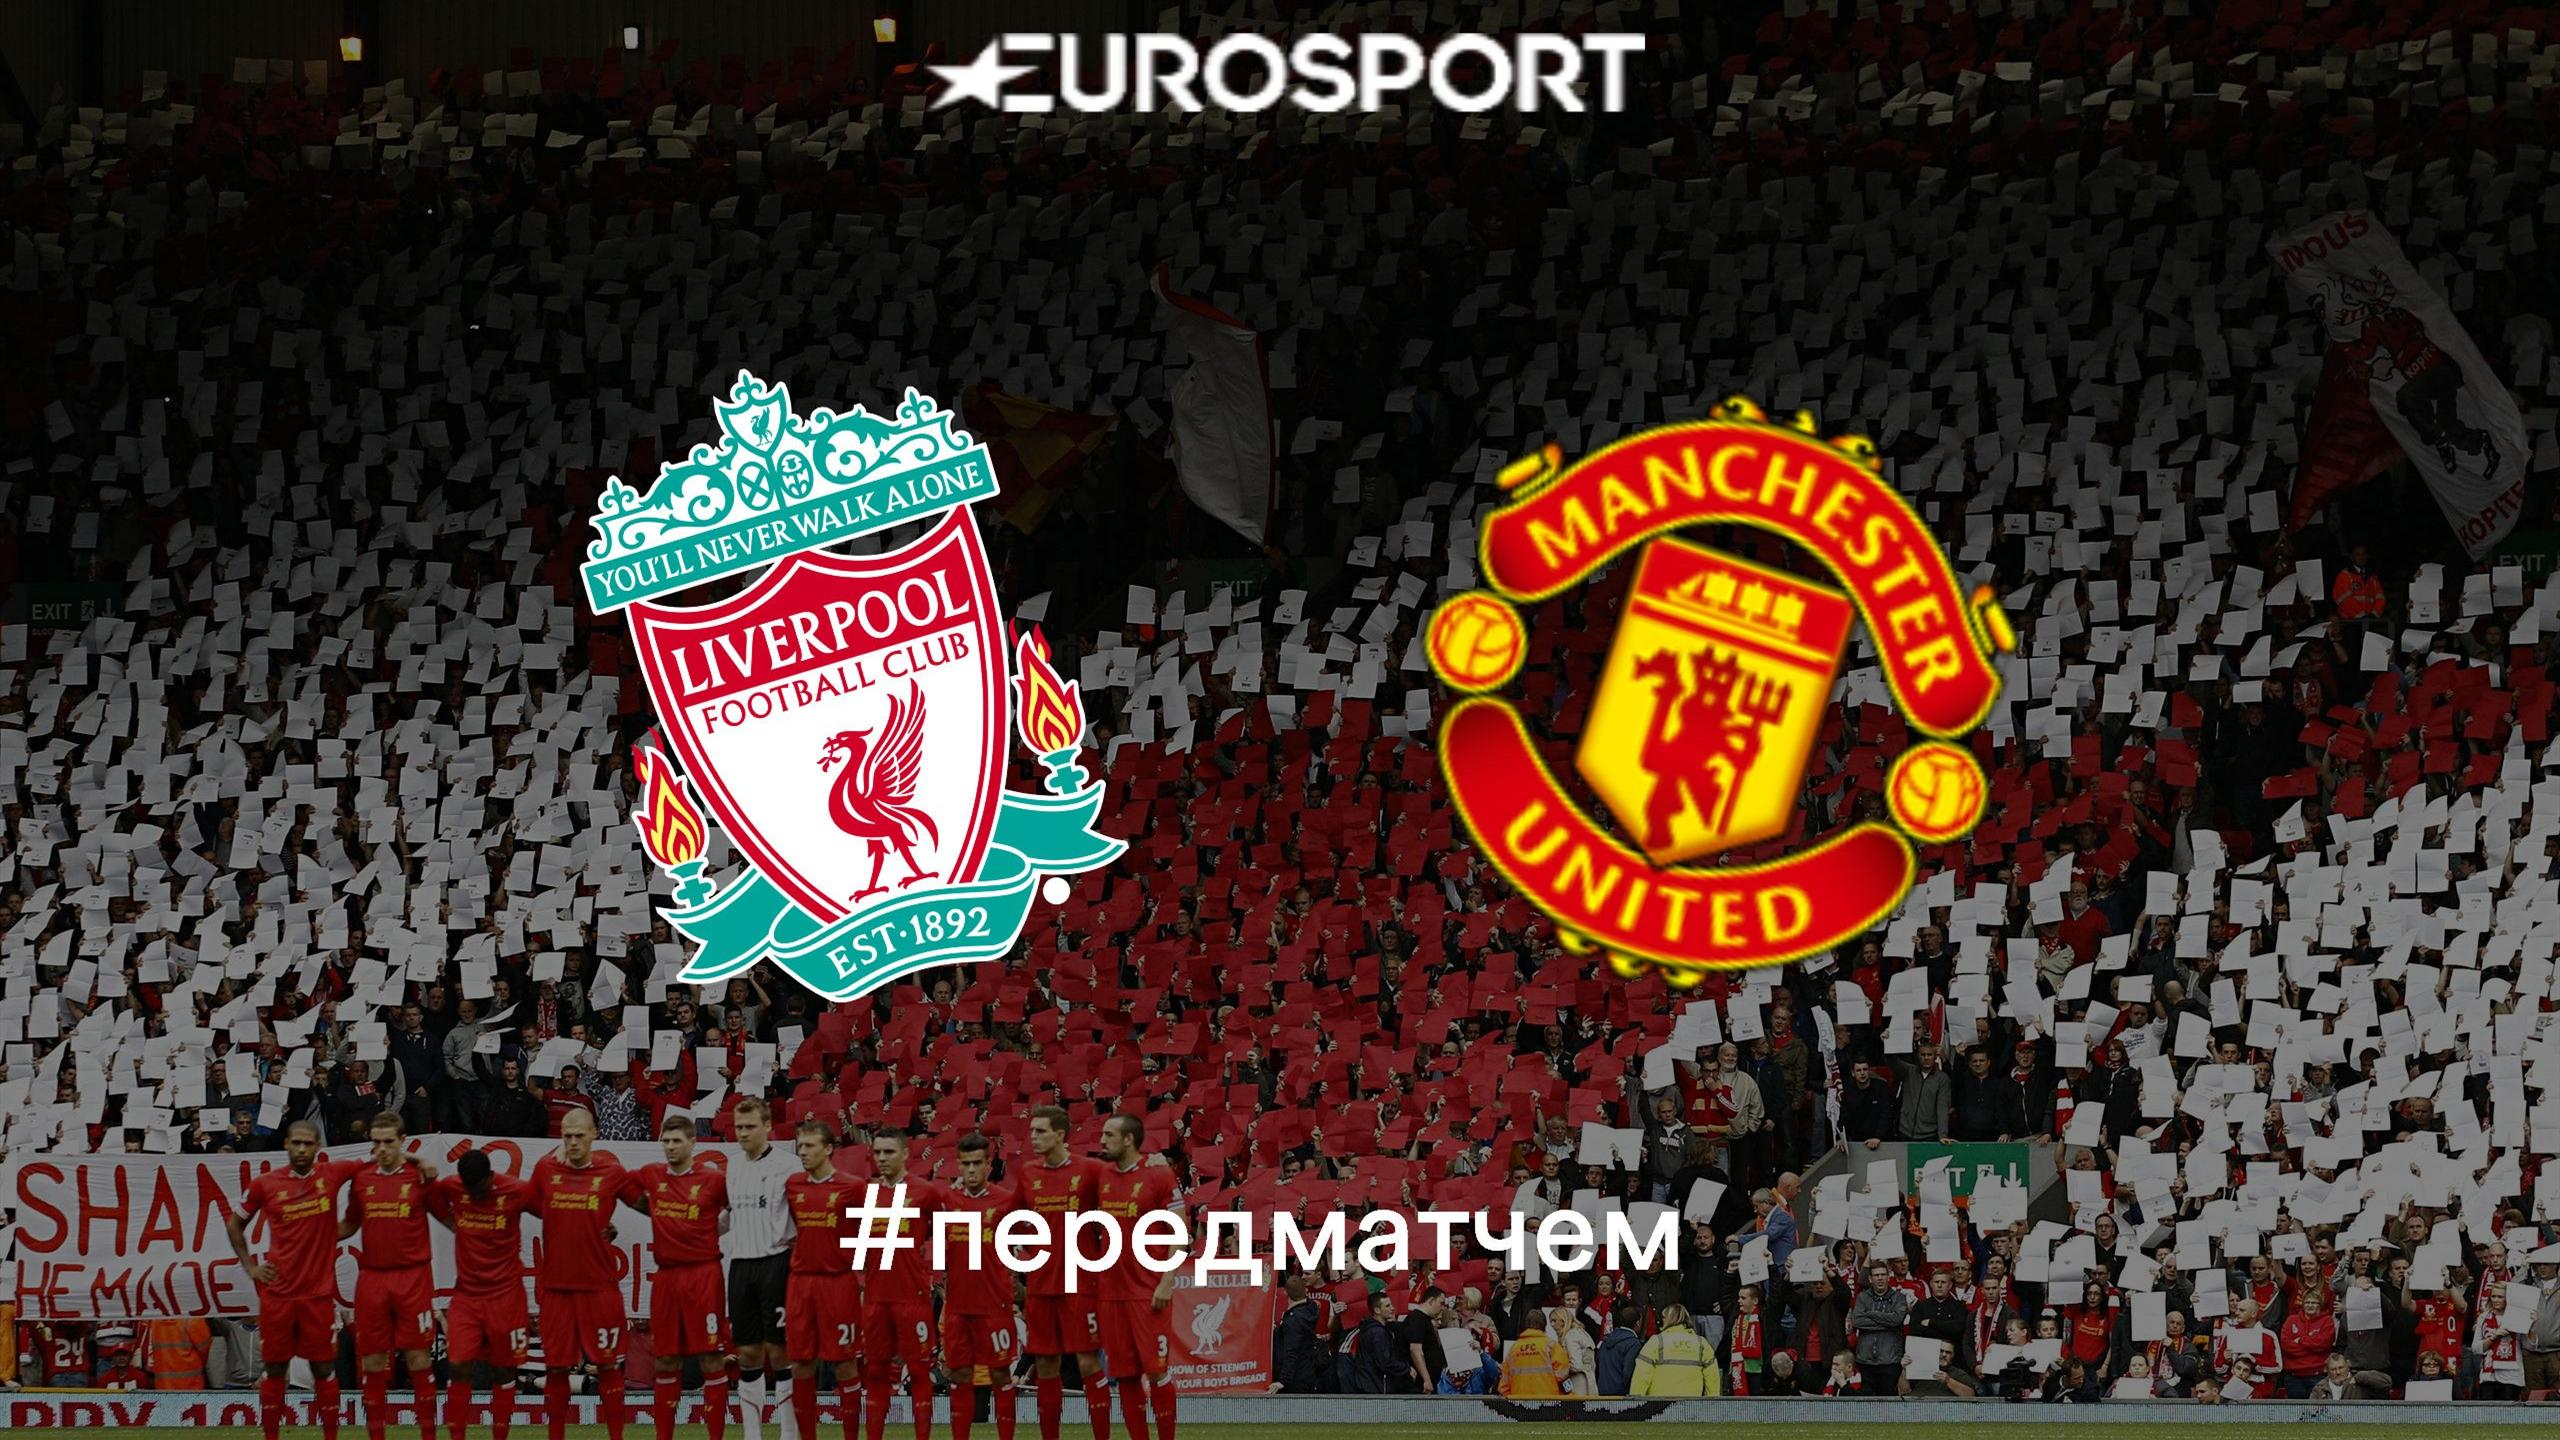 Eurosport ливерпулъ манчестер юнайтед